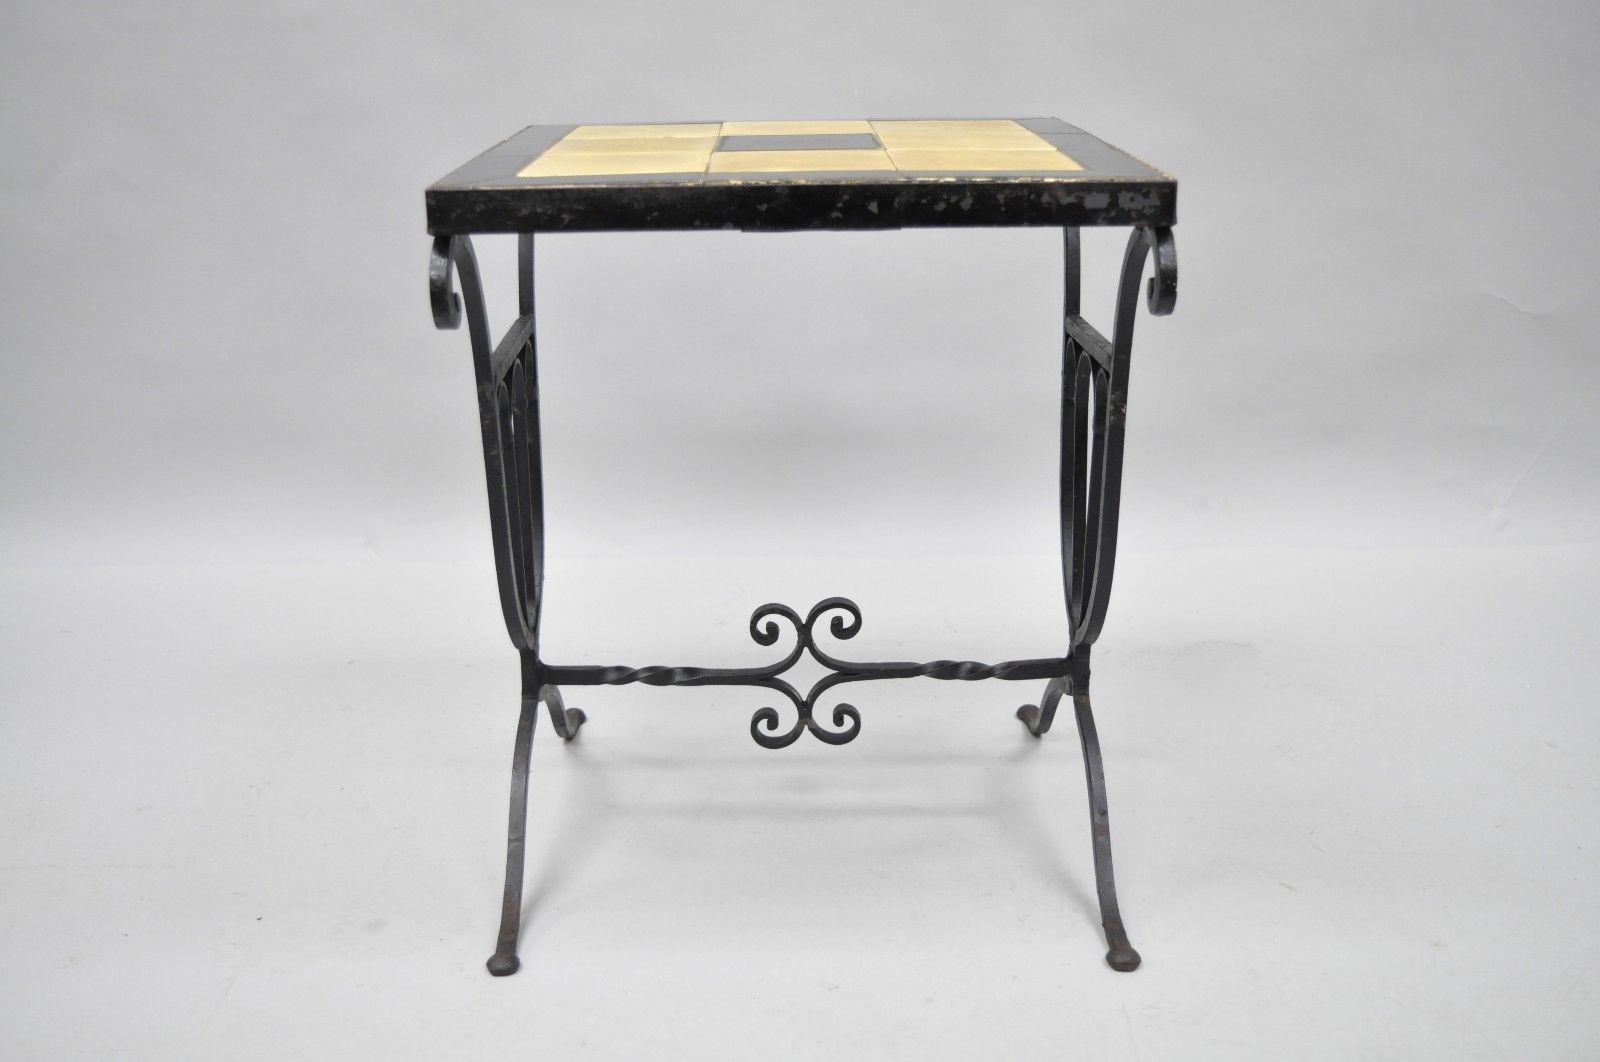 Art Nouveau Wrought Iron Metal Ceramic Tile Top Small Side Table Rh Chairish Com Mid Century Modern Coffee Set